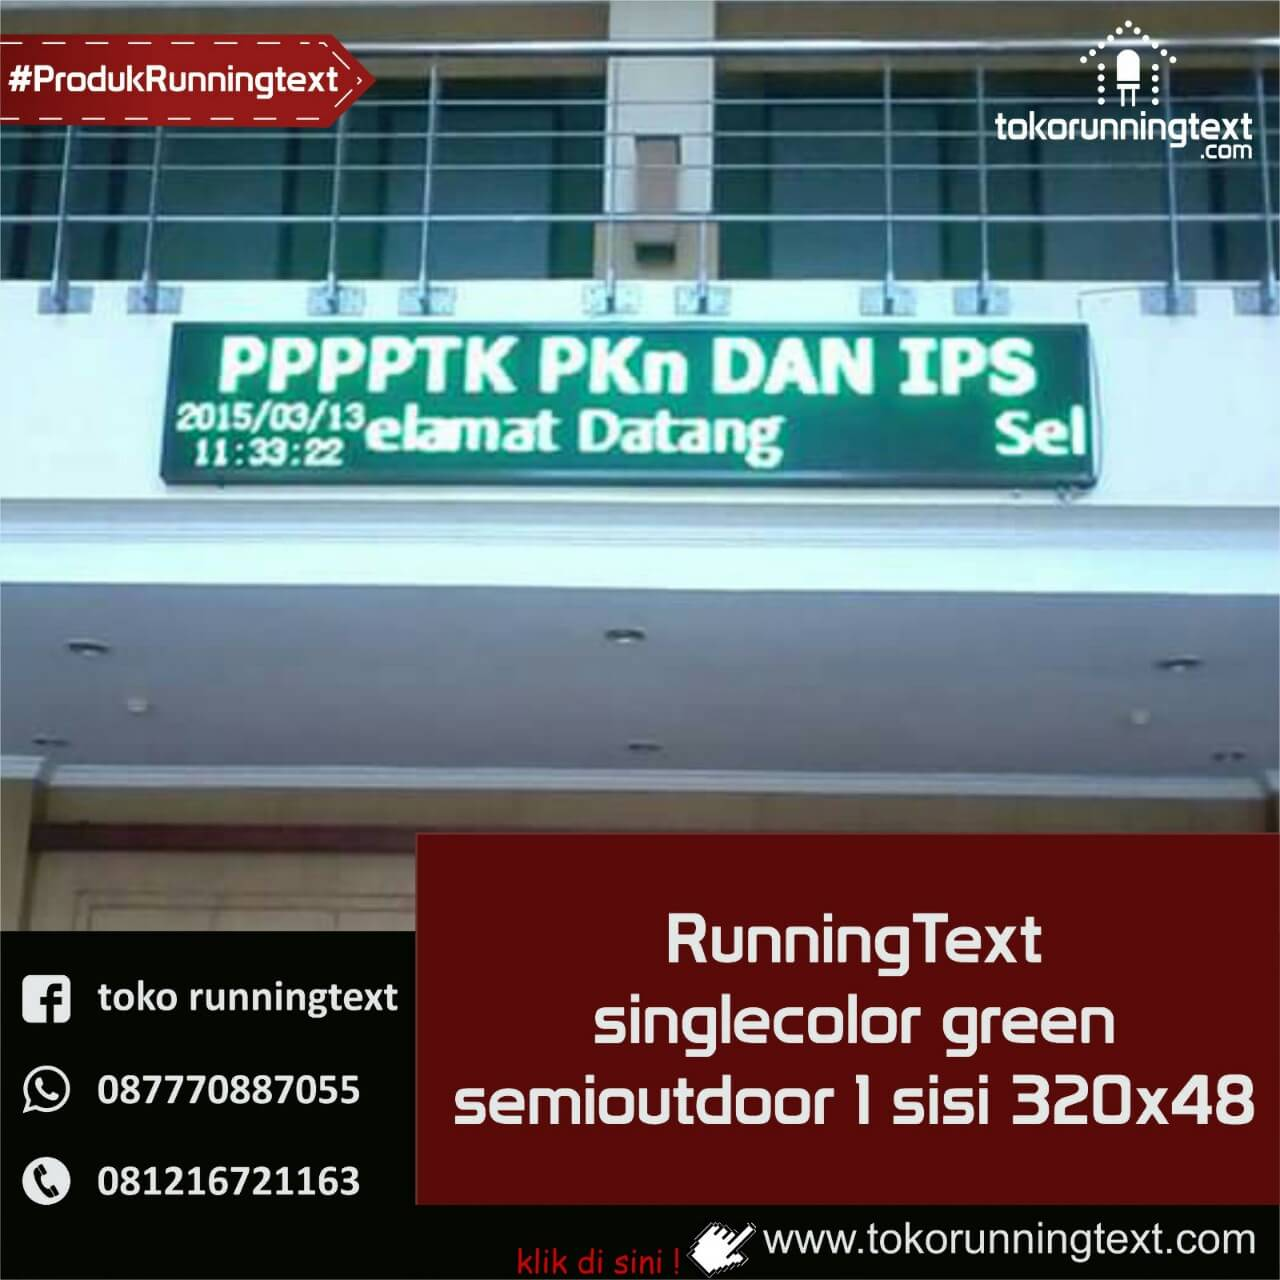 Runningtext singlecolor Green, semioutdoor 1 sisi 320x48